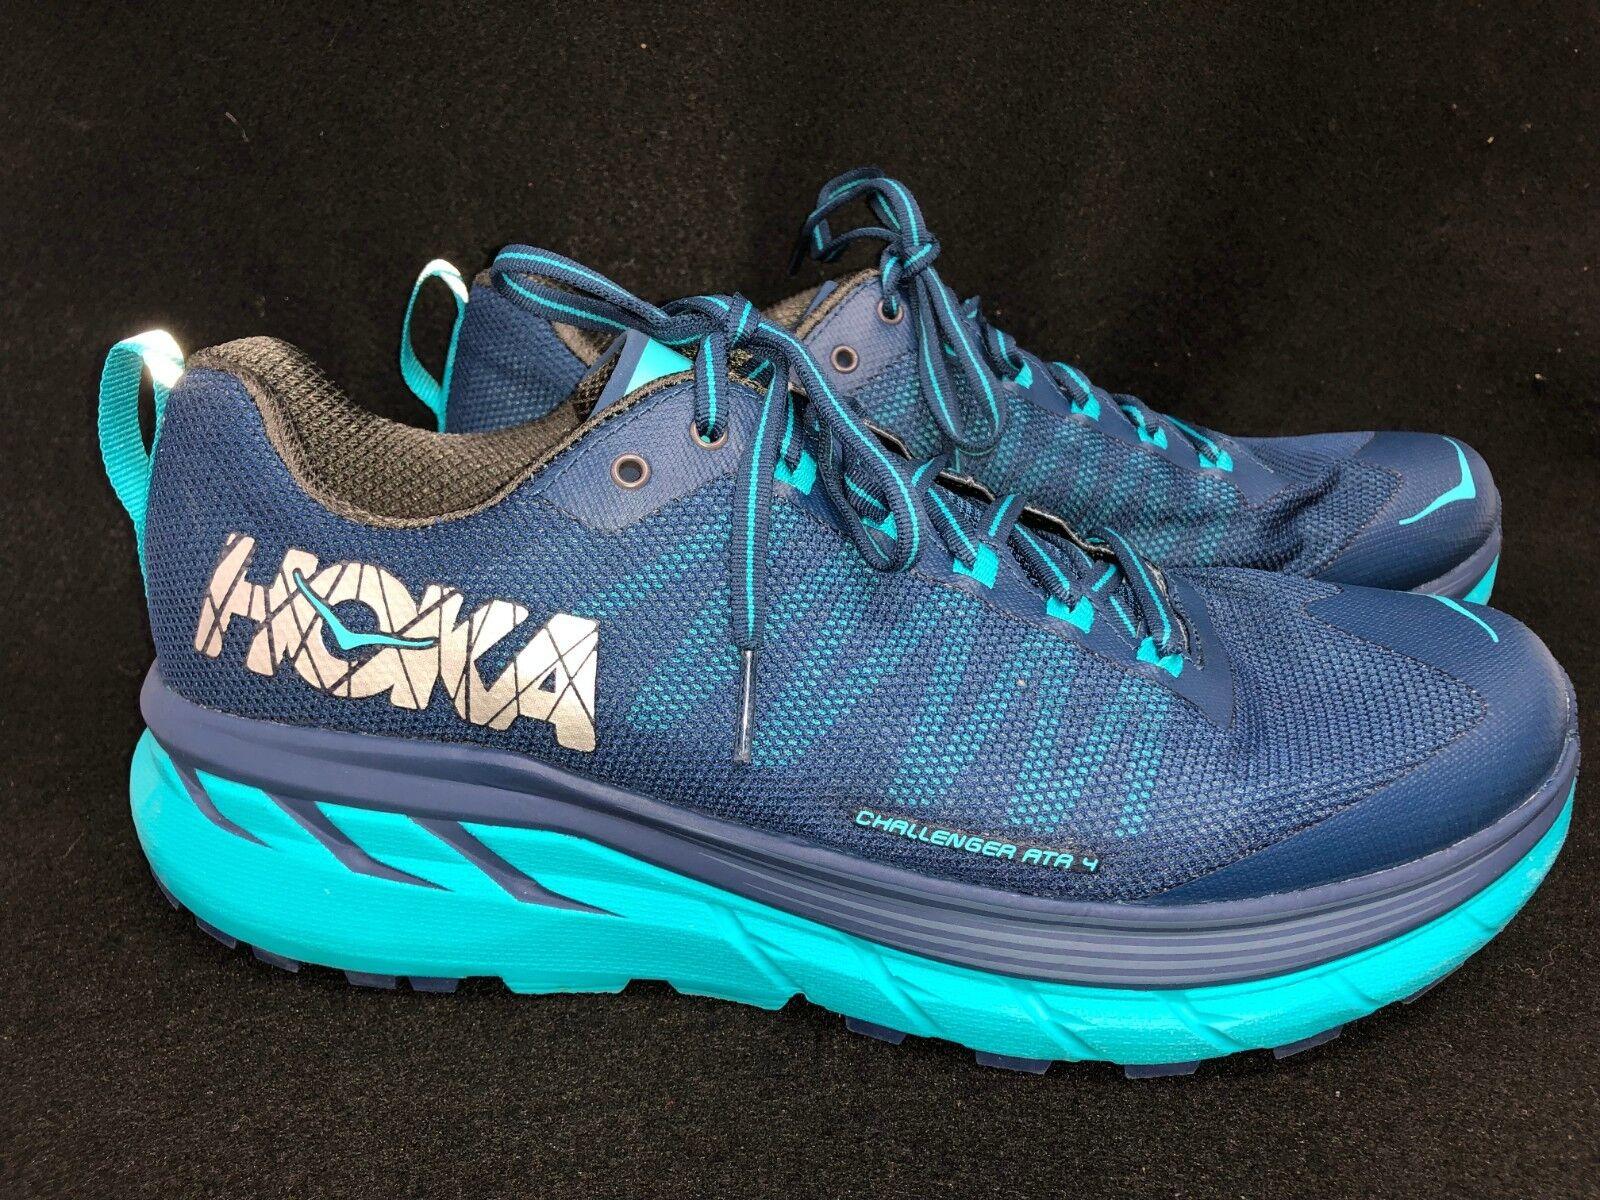 Hoka One One Challenger ATR 4 Poseidon blueebird Tennis Running shoes Athletic